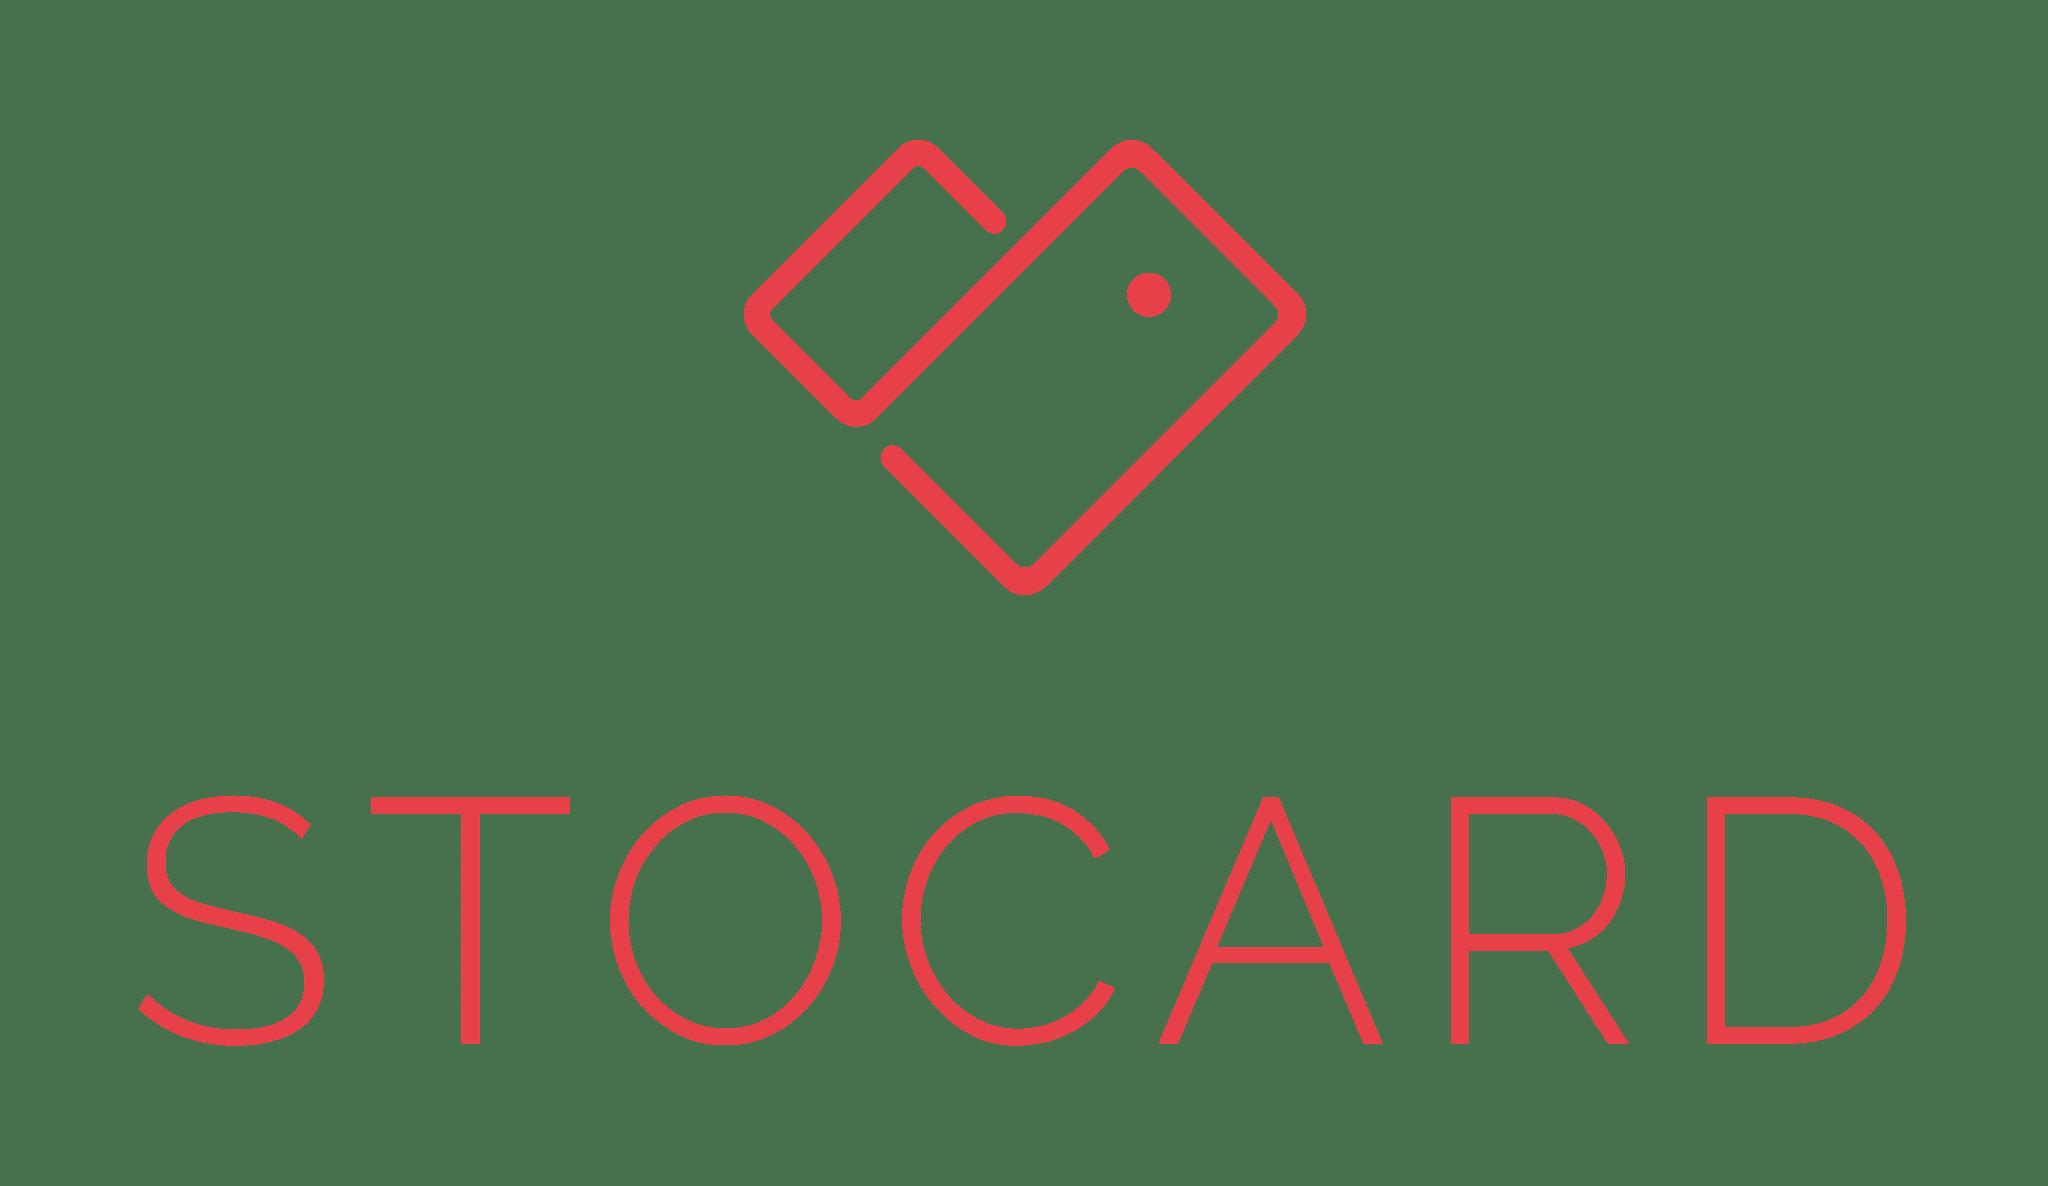 stocard-client-dejamobile